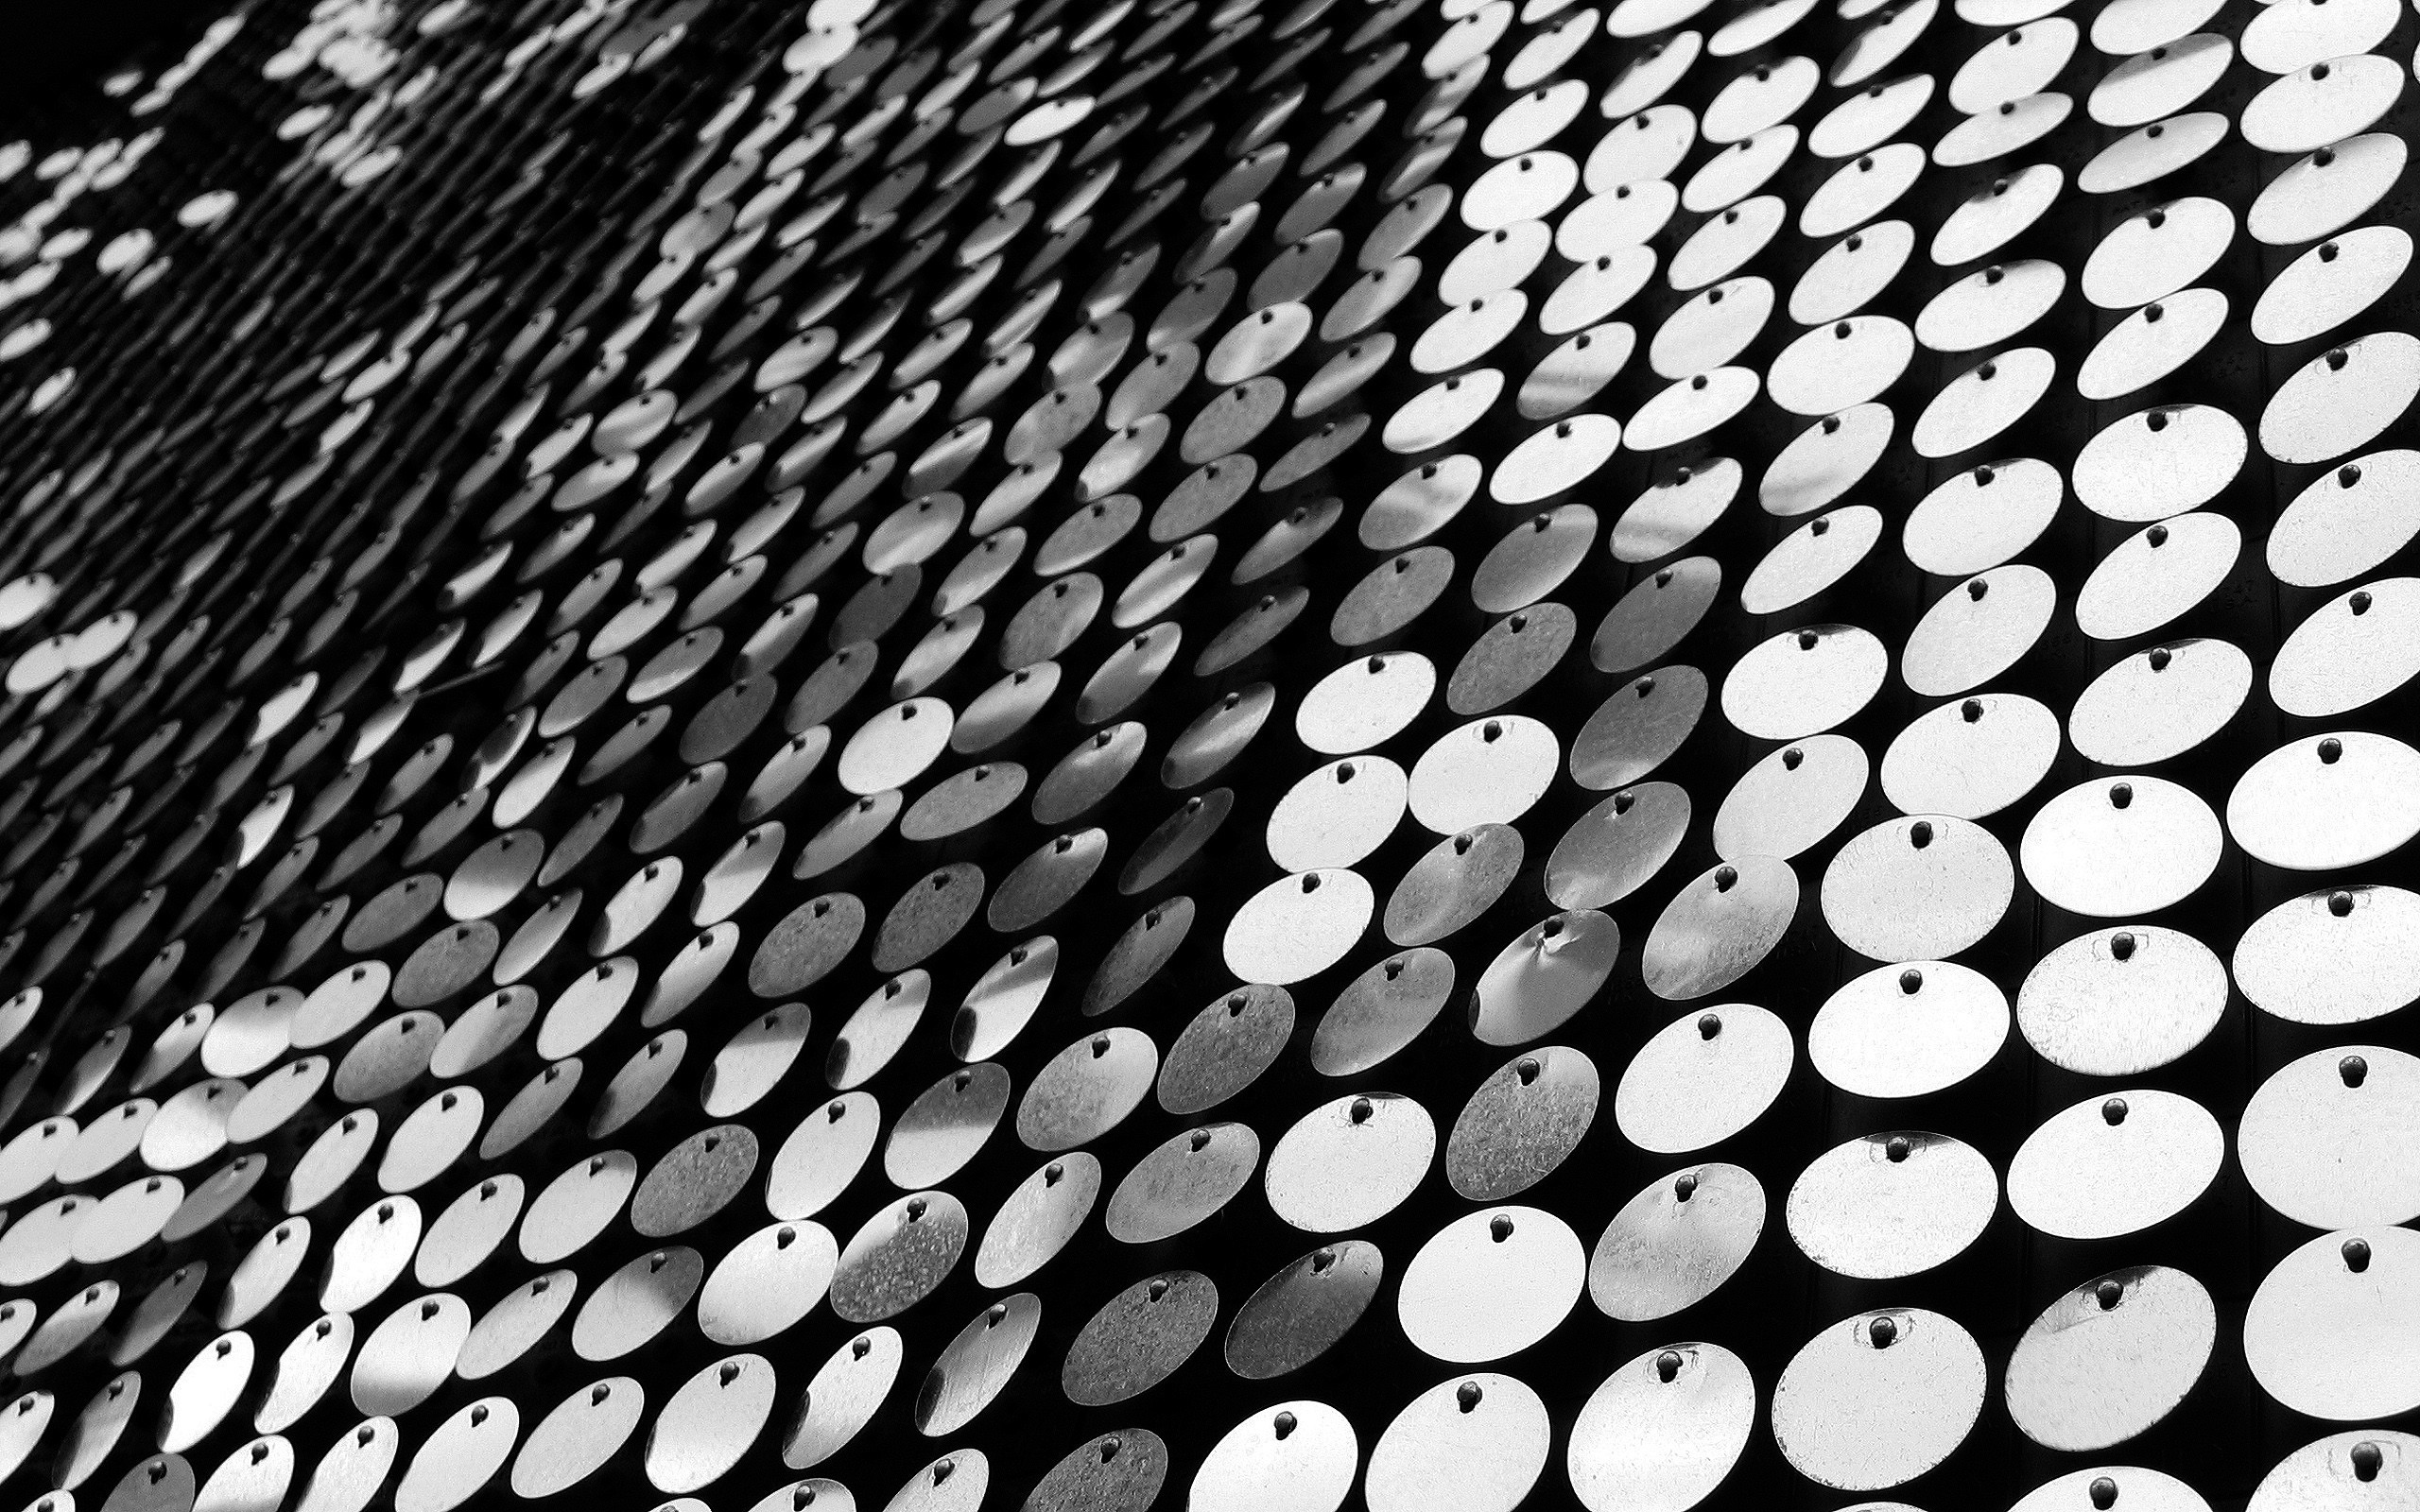 Abstract Glitter HD Wallpaper   Download HD Wallpapers for Desktop